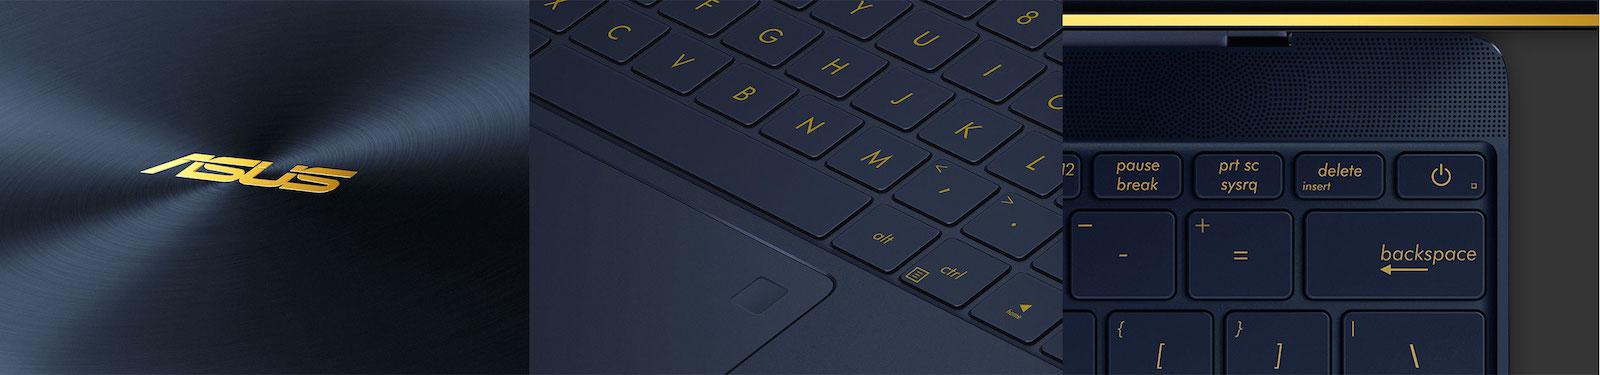 ASUS ZenBook 3 デザイン